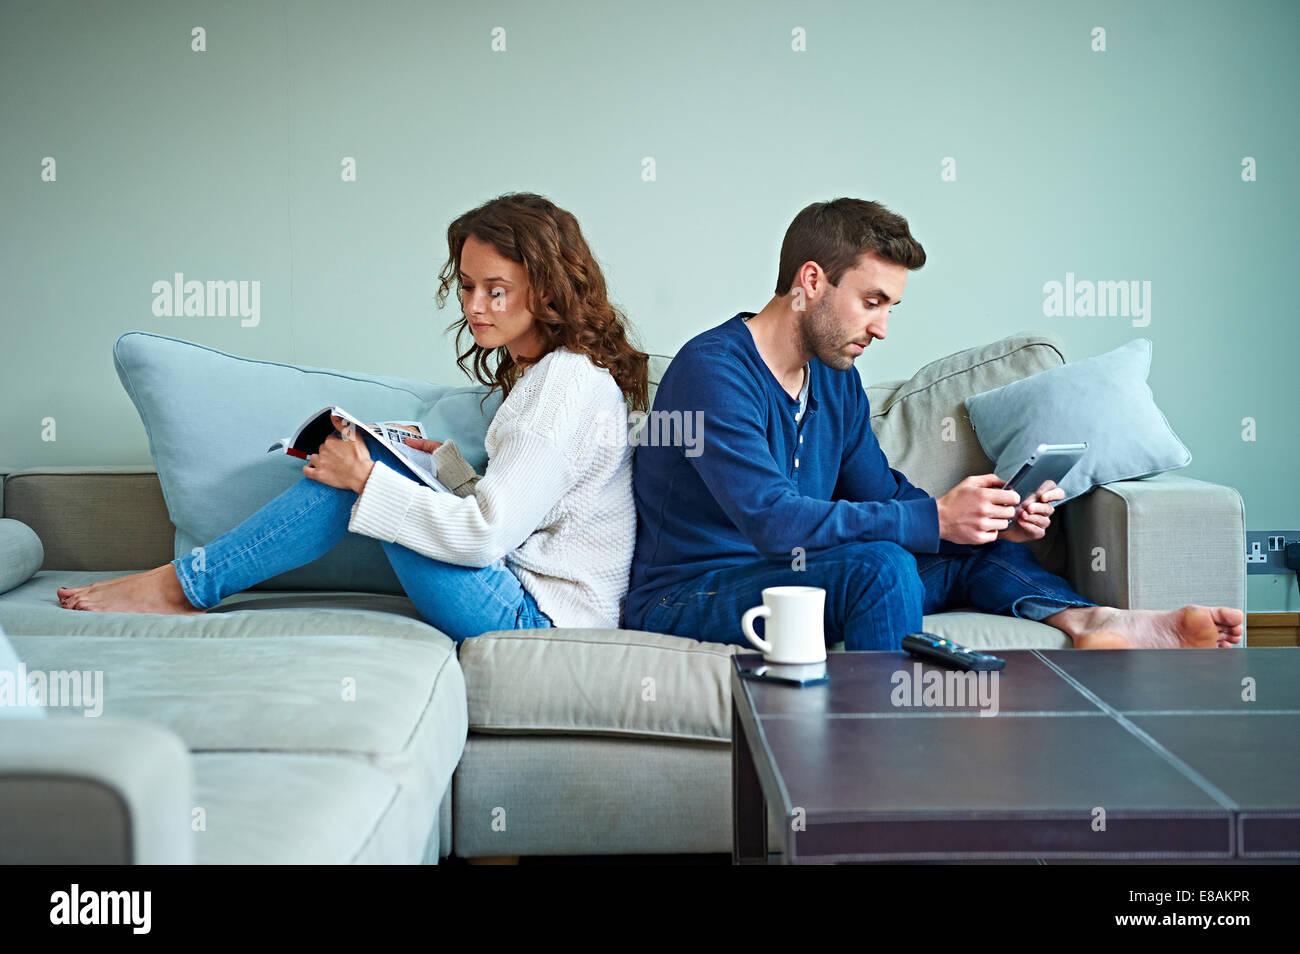 Couple on sofa Photo Stock